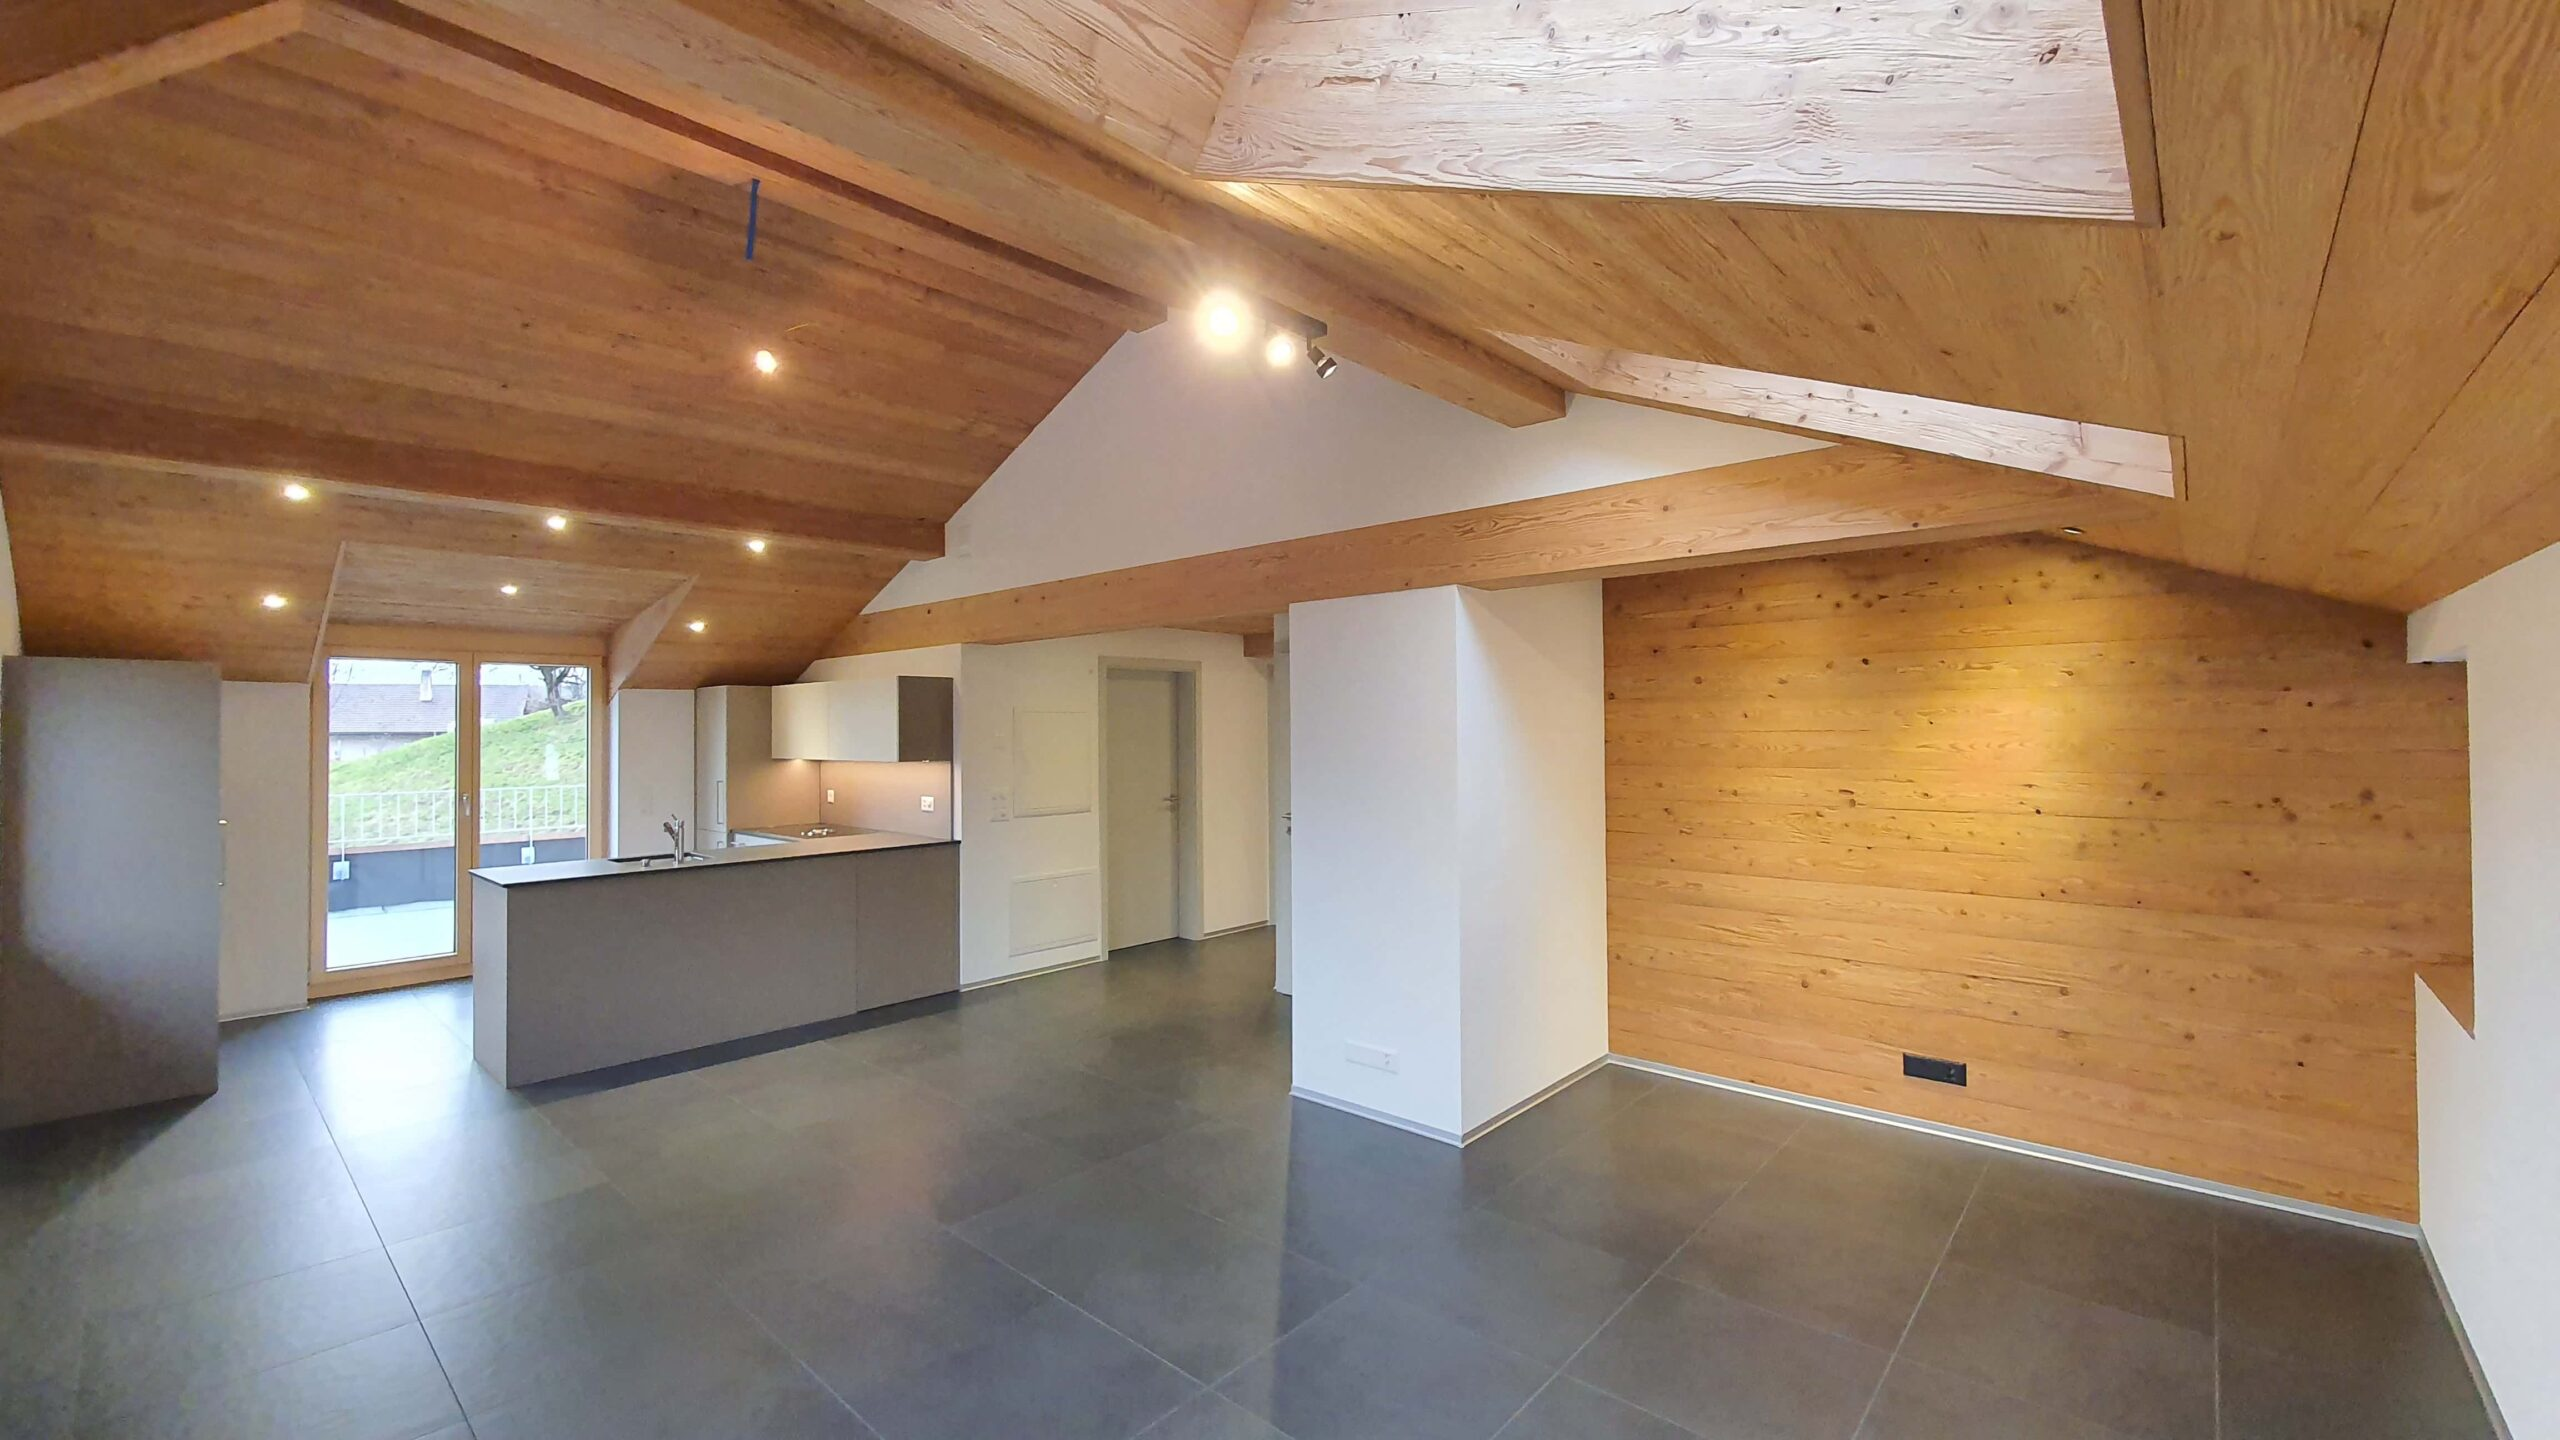 Wooddesign_Holzdesign_Altholz_rustikal_modern Holzdecke_Balkenverkleidung_Wandverkleidung_Wohnungumbau_Ausbau Wohnung (3)-min